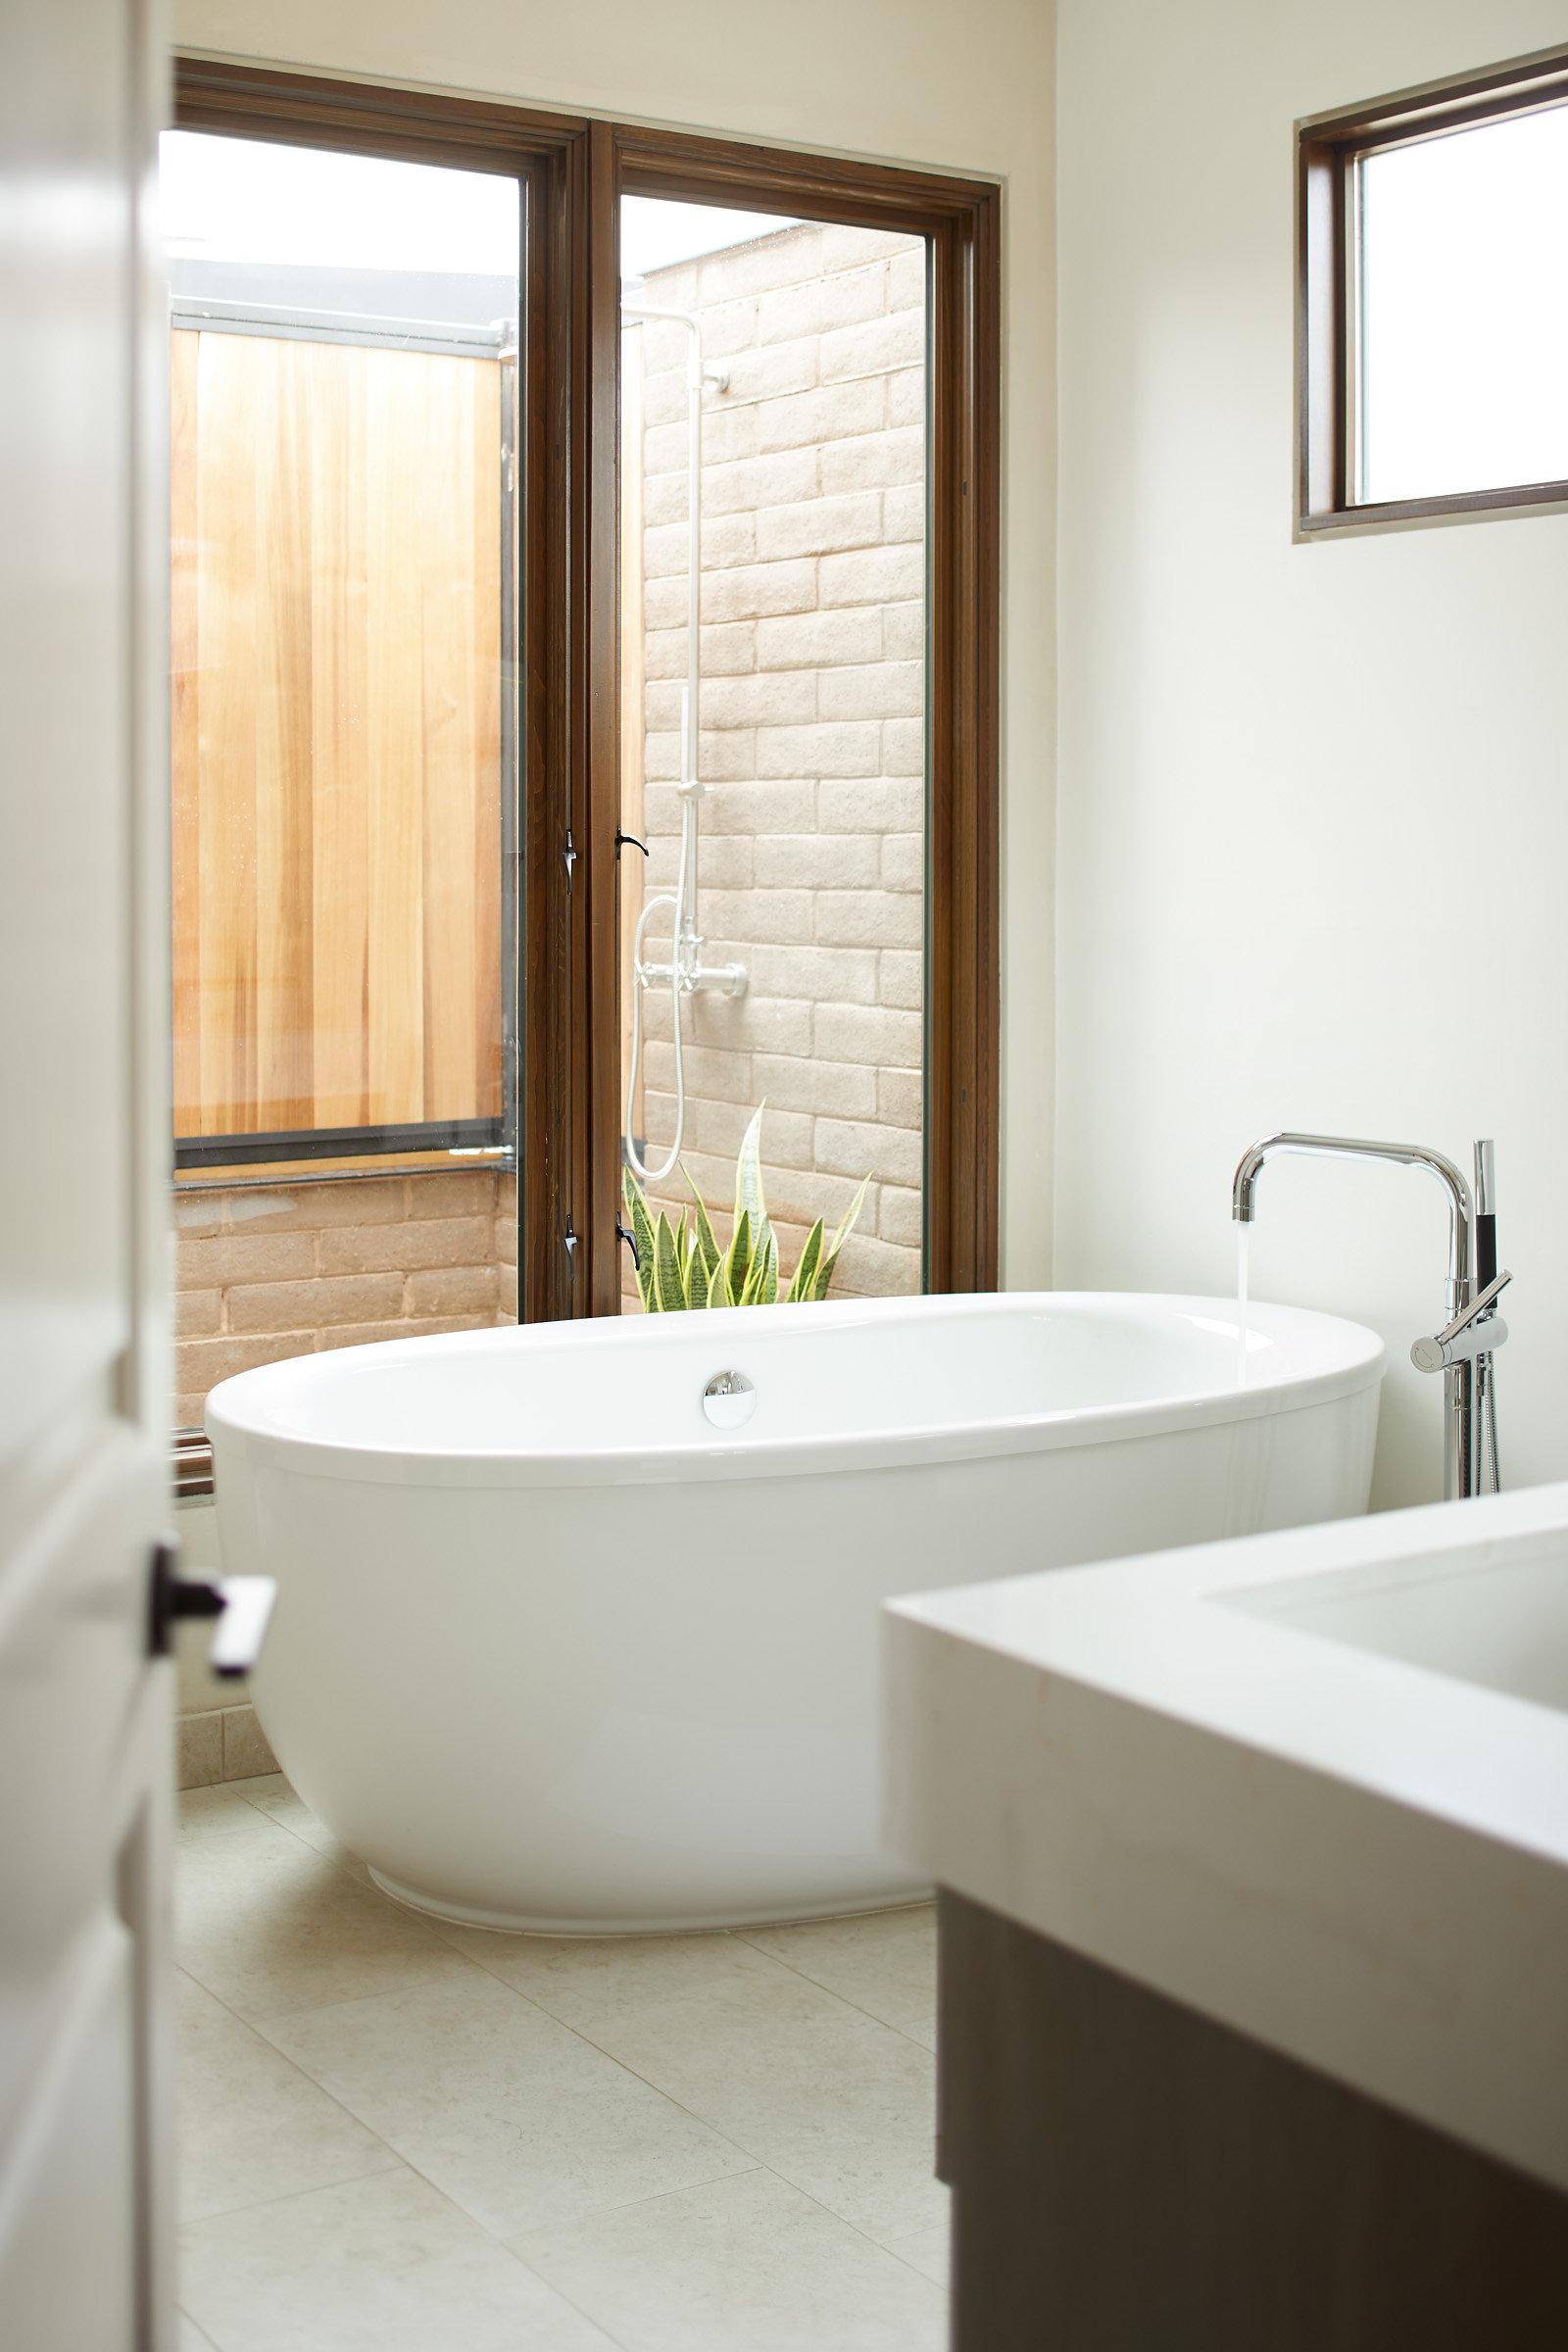 180214_Retreat942_bathroom_444.jpg